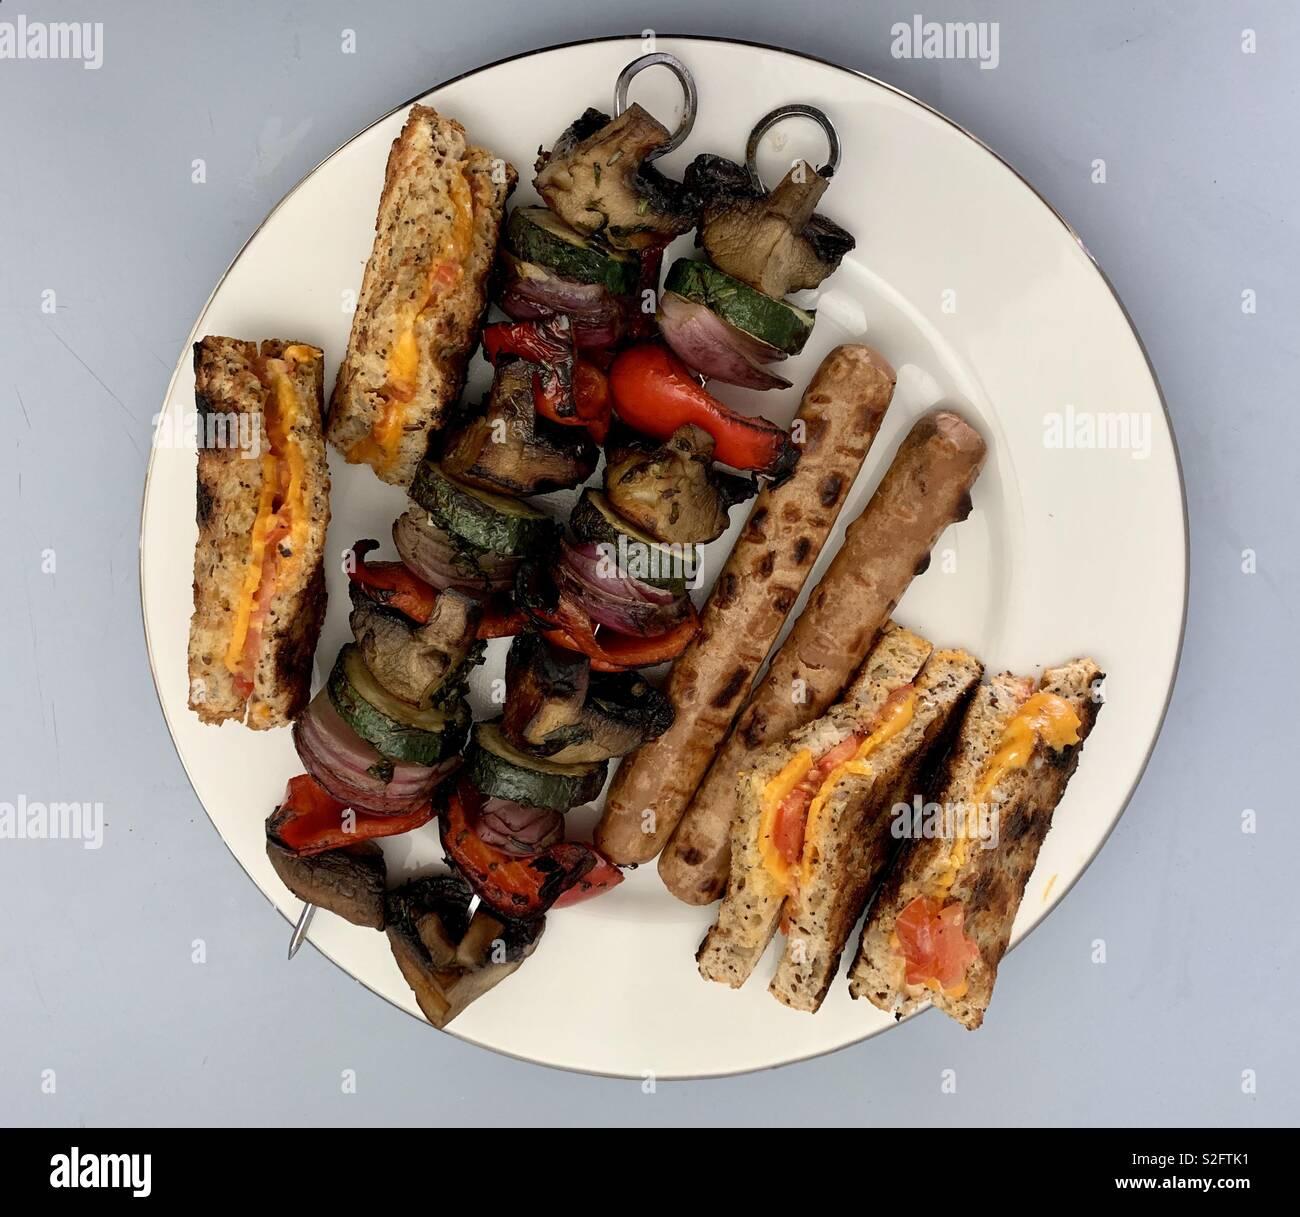 Vegan BBQ delight. Stock Photo